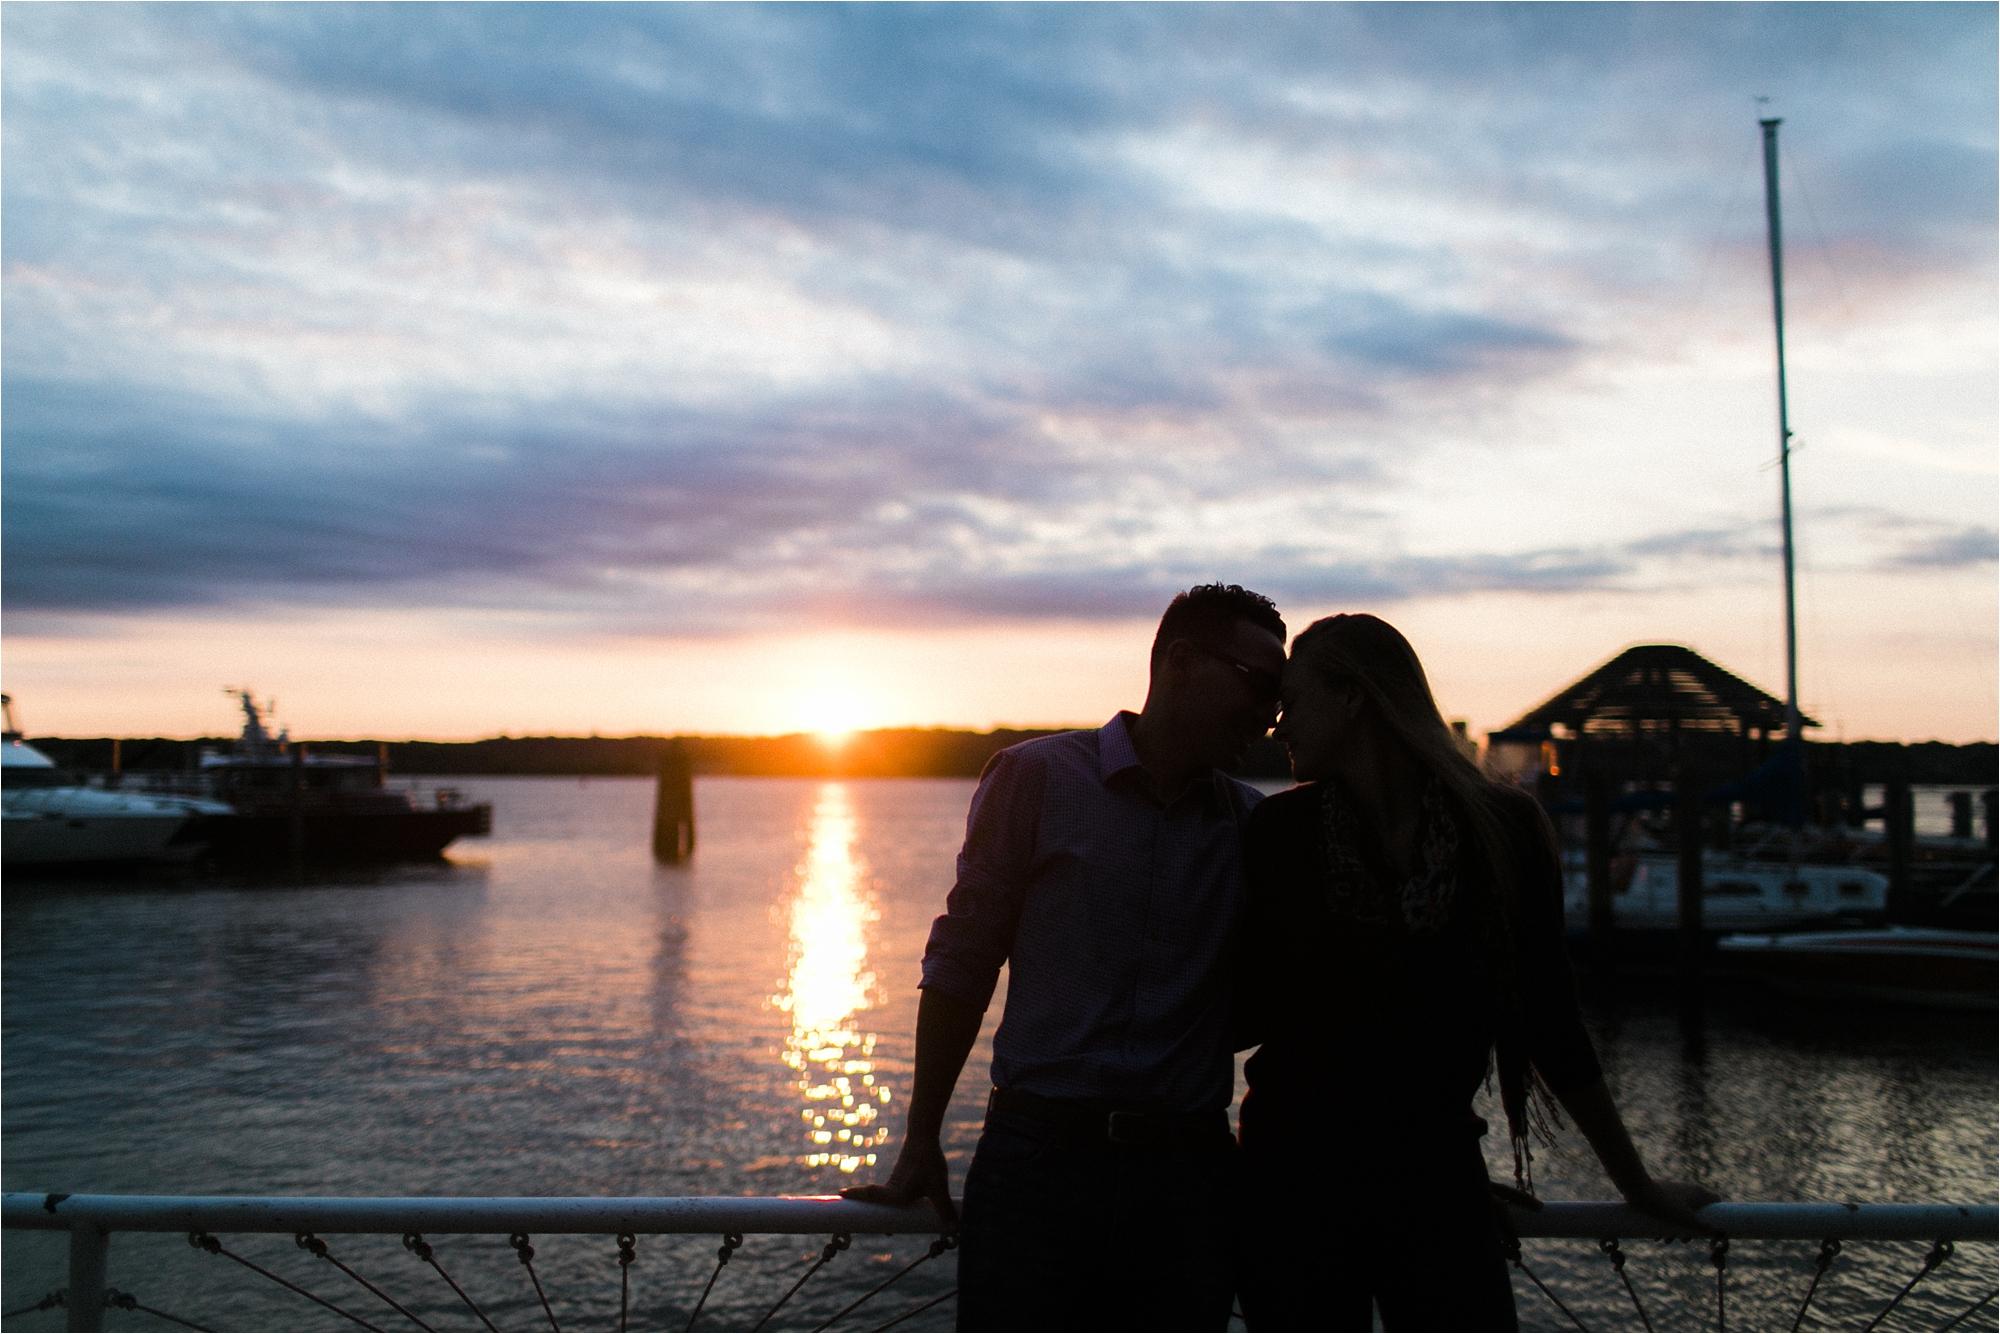 stephanie-yonce-photography-sunrise-engagement-old-town-alexandria-photos_0003.jpg